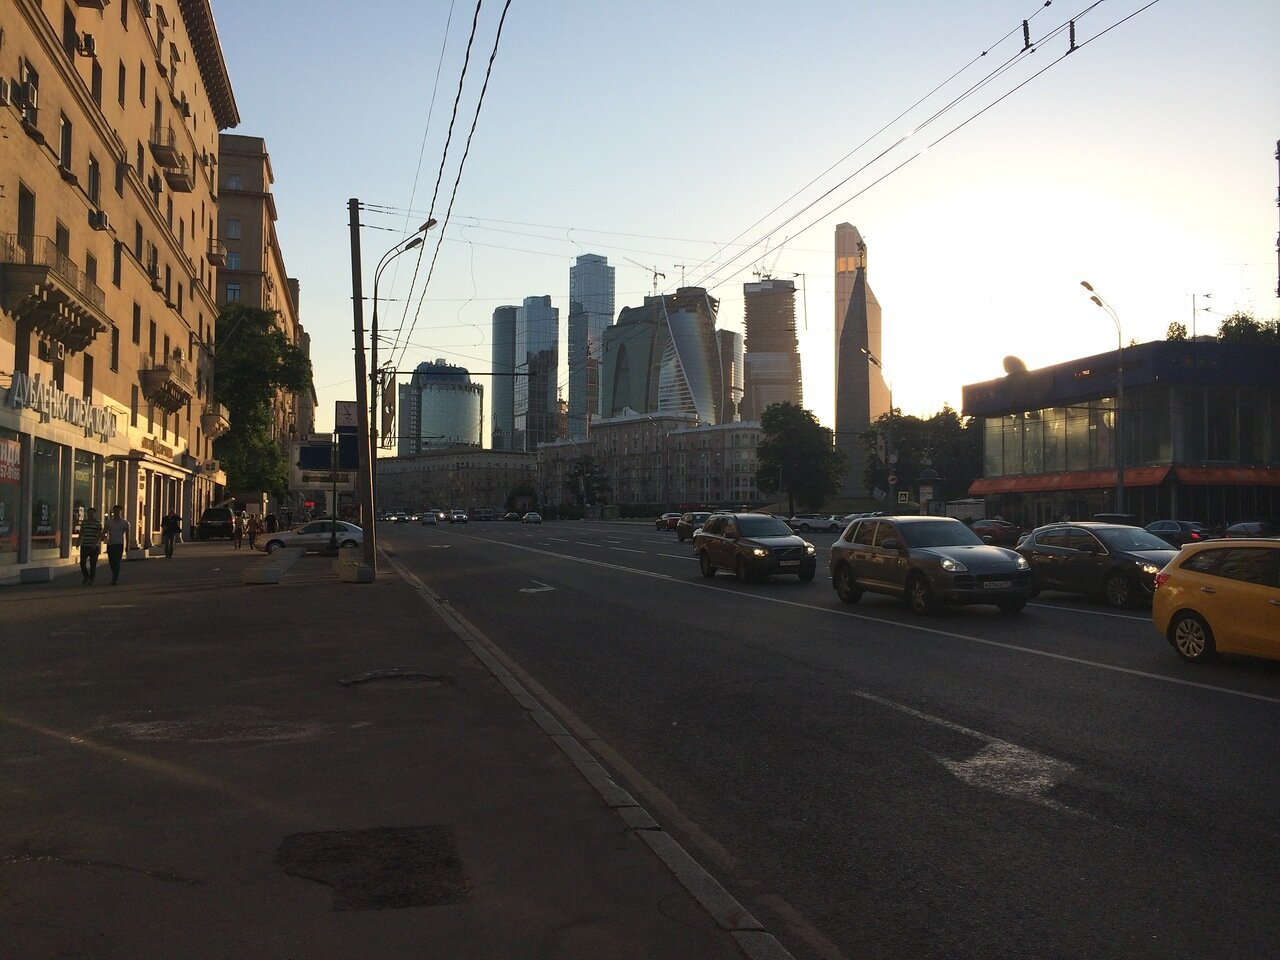 http://img-fotki.yandex.ru/get/9667/82260854.303/0_bf27e_1beb3a40_XXXL.jpg